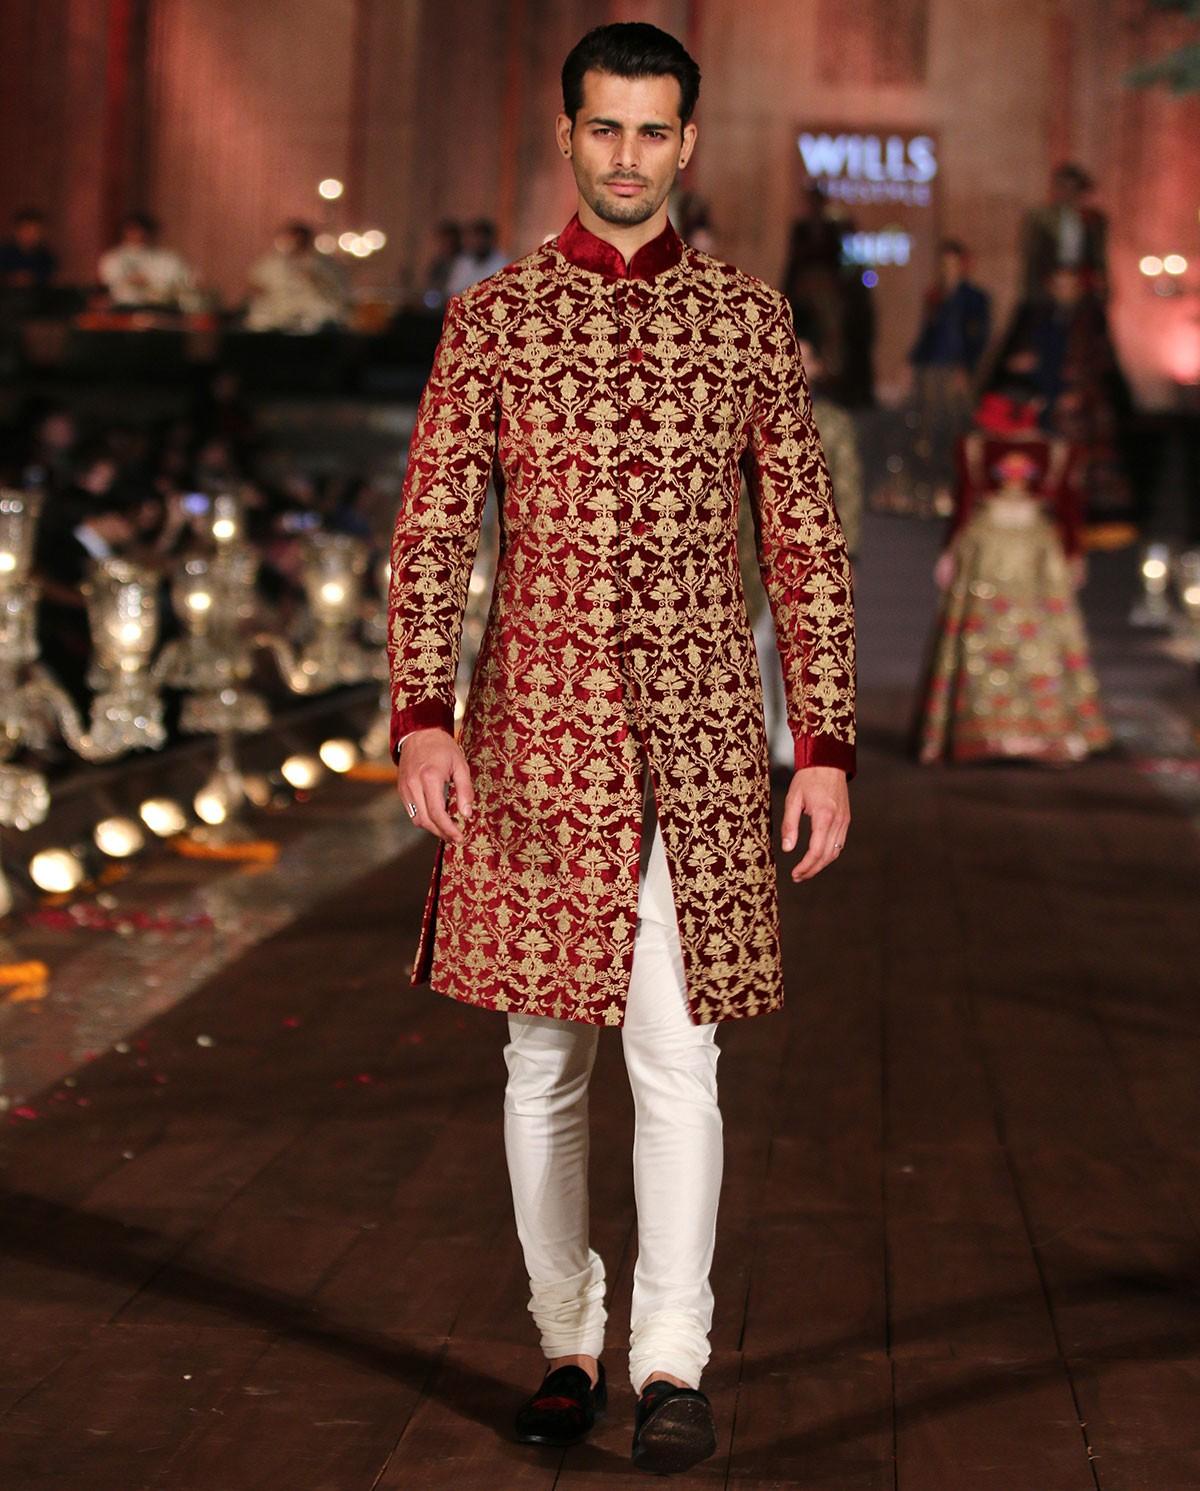 inidan-designer-sherwanis-rohit-bal-1